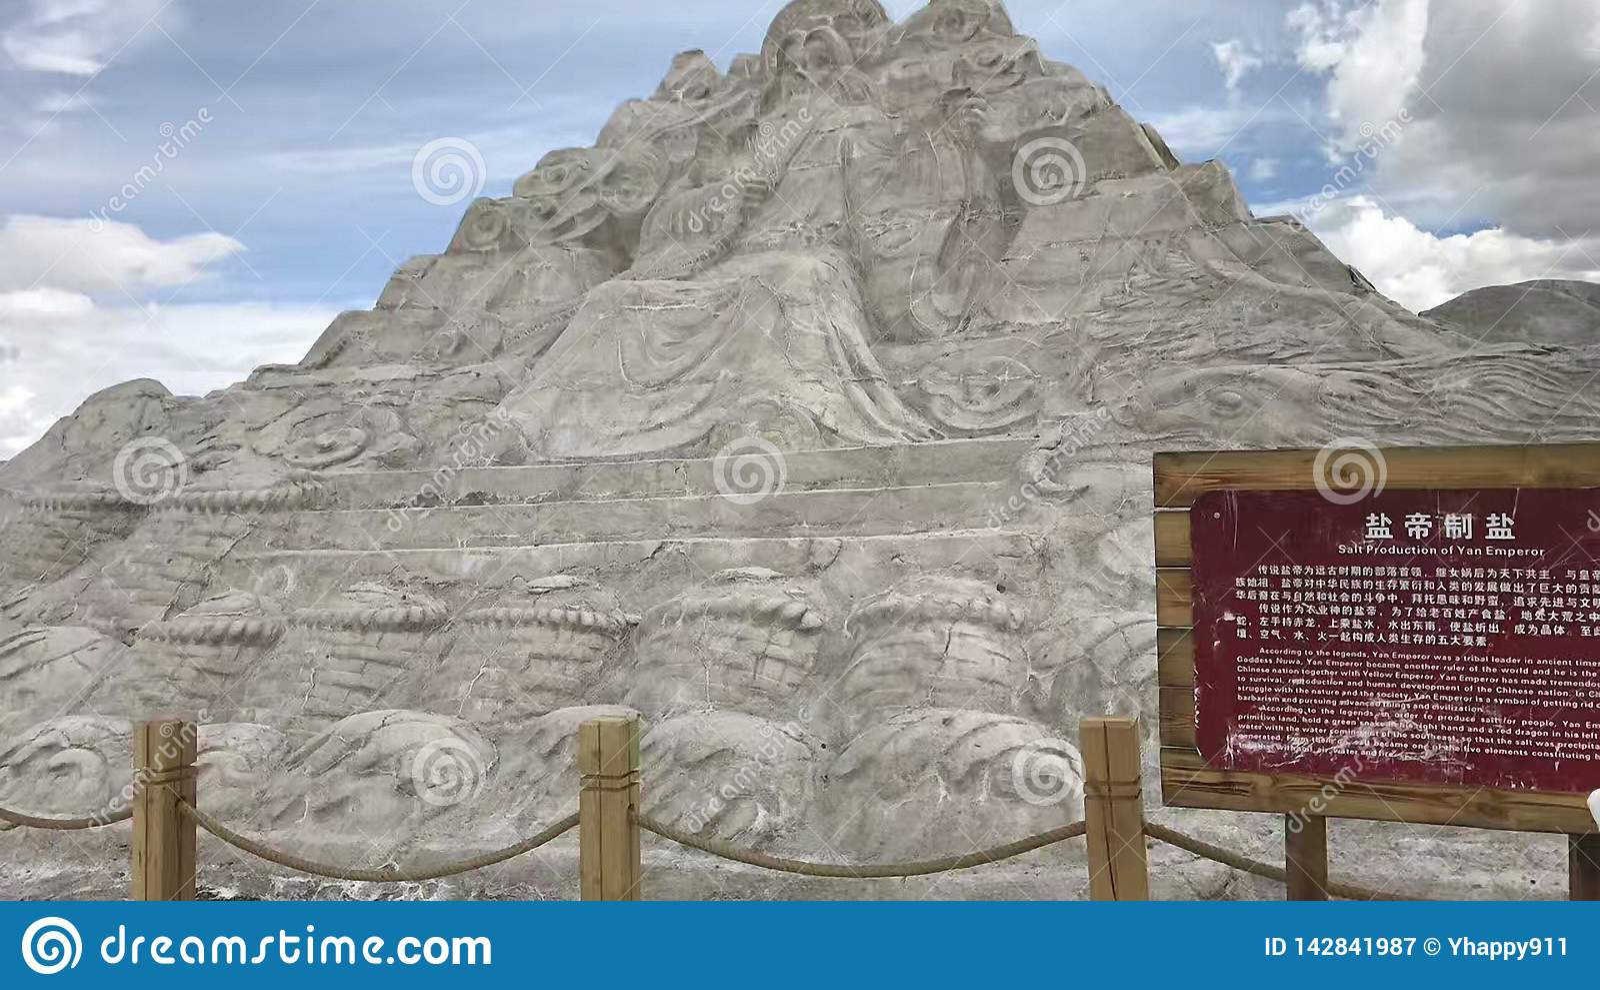 Las tallas de las tallas de piedra de la sal china antigua están vivas y vivas